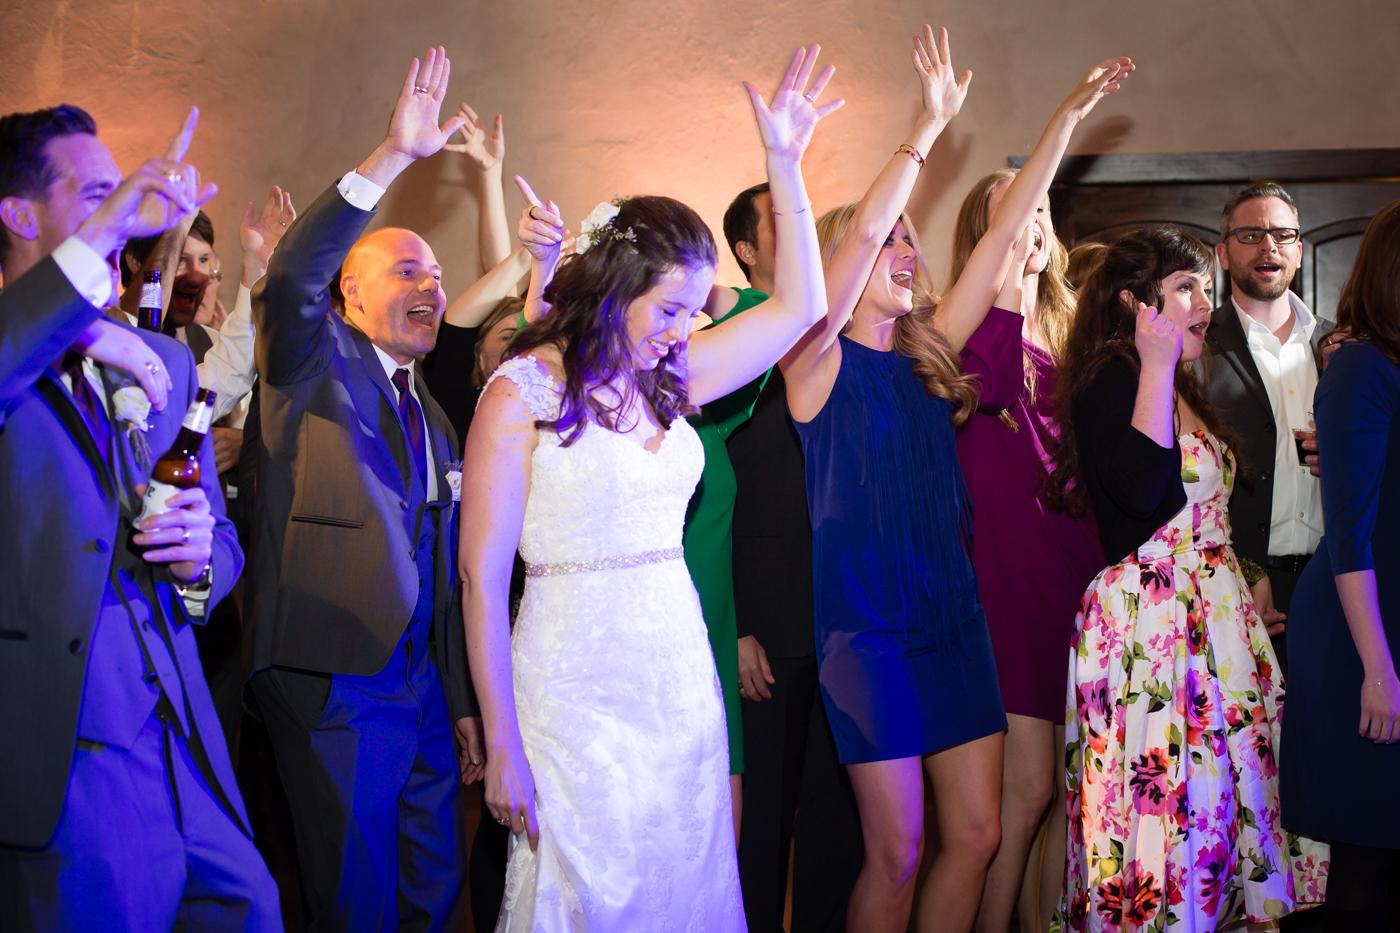 Austin-wedding-photo-and-video-032.jpg